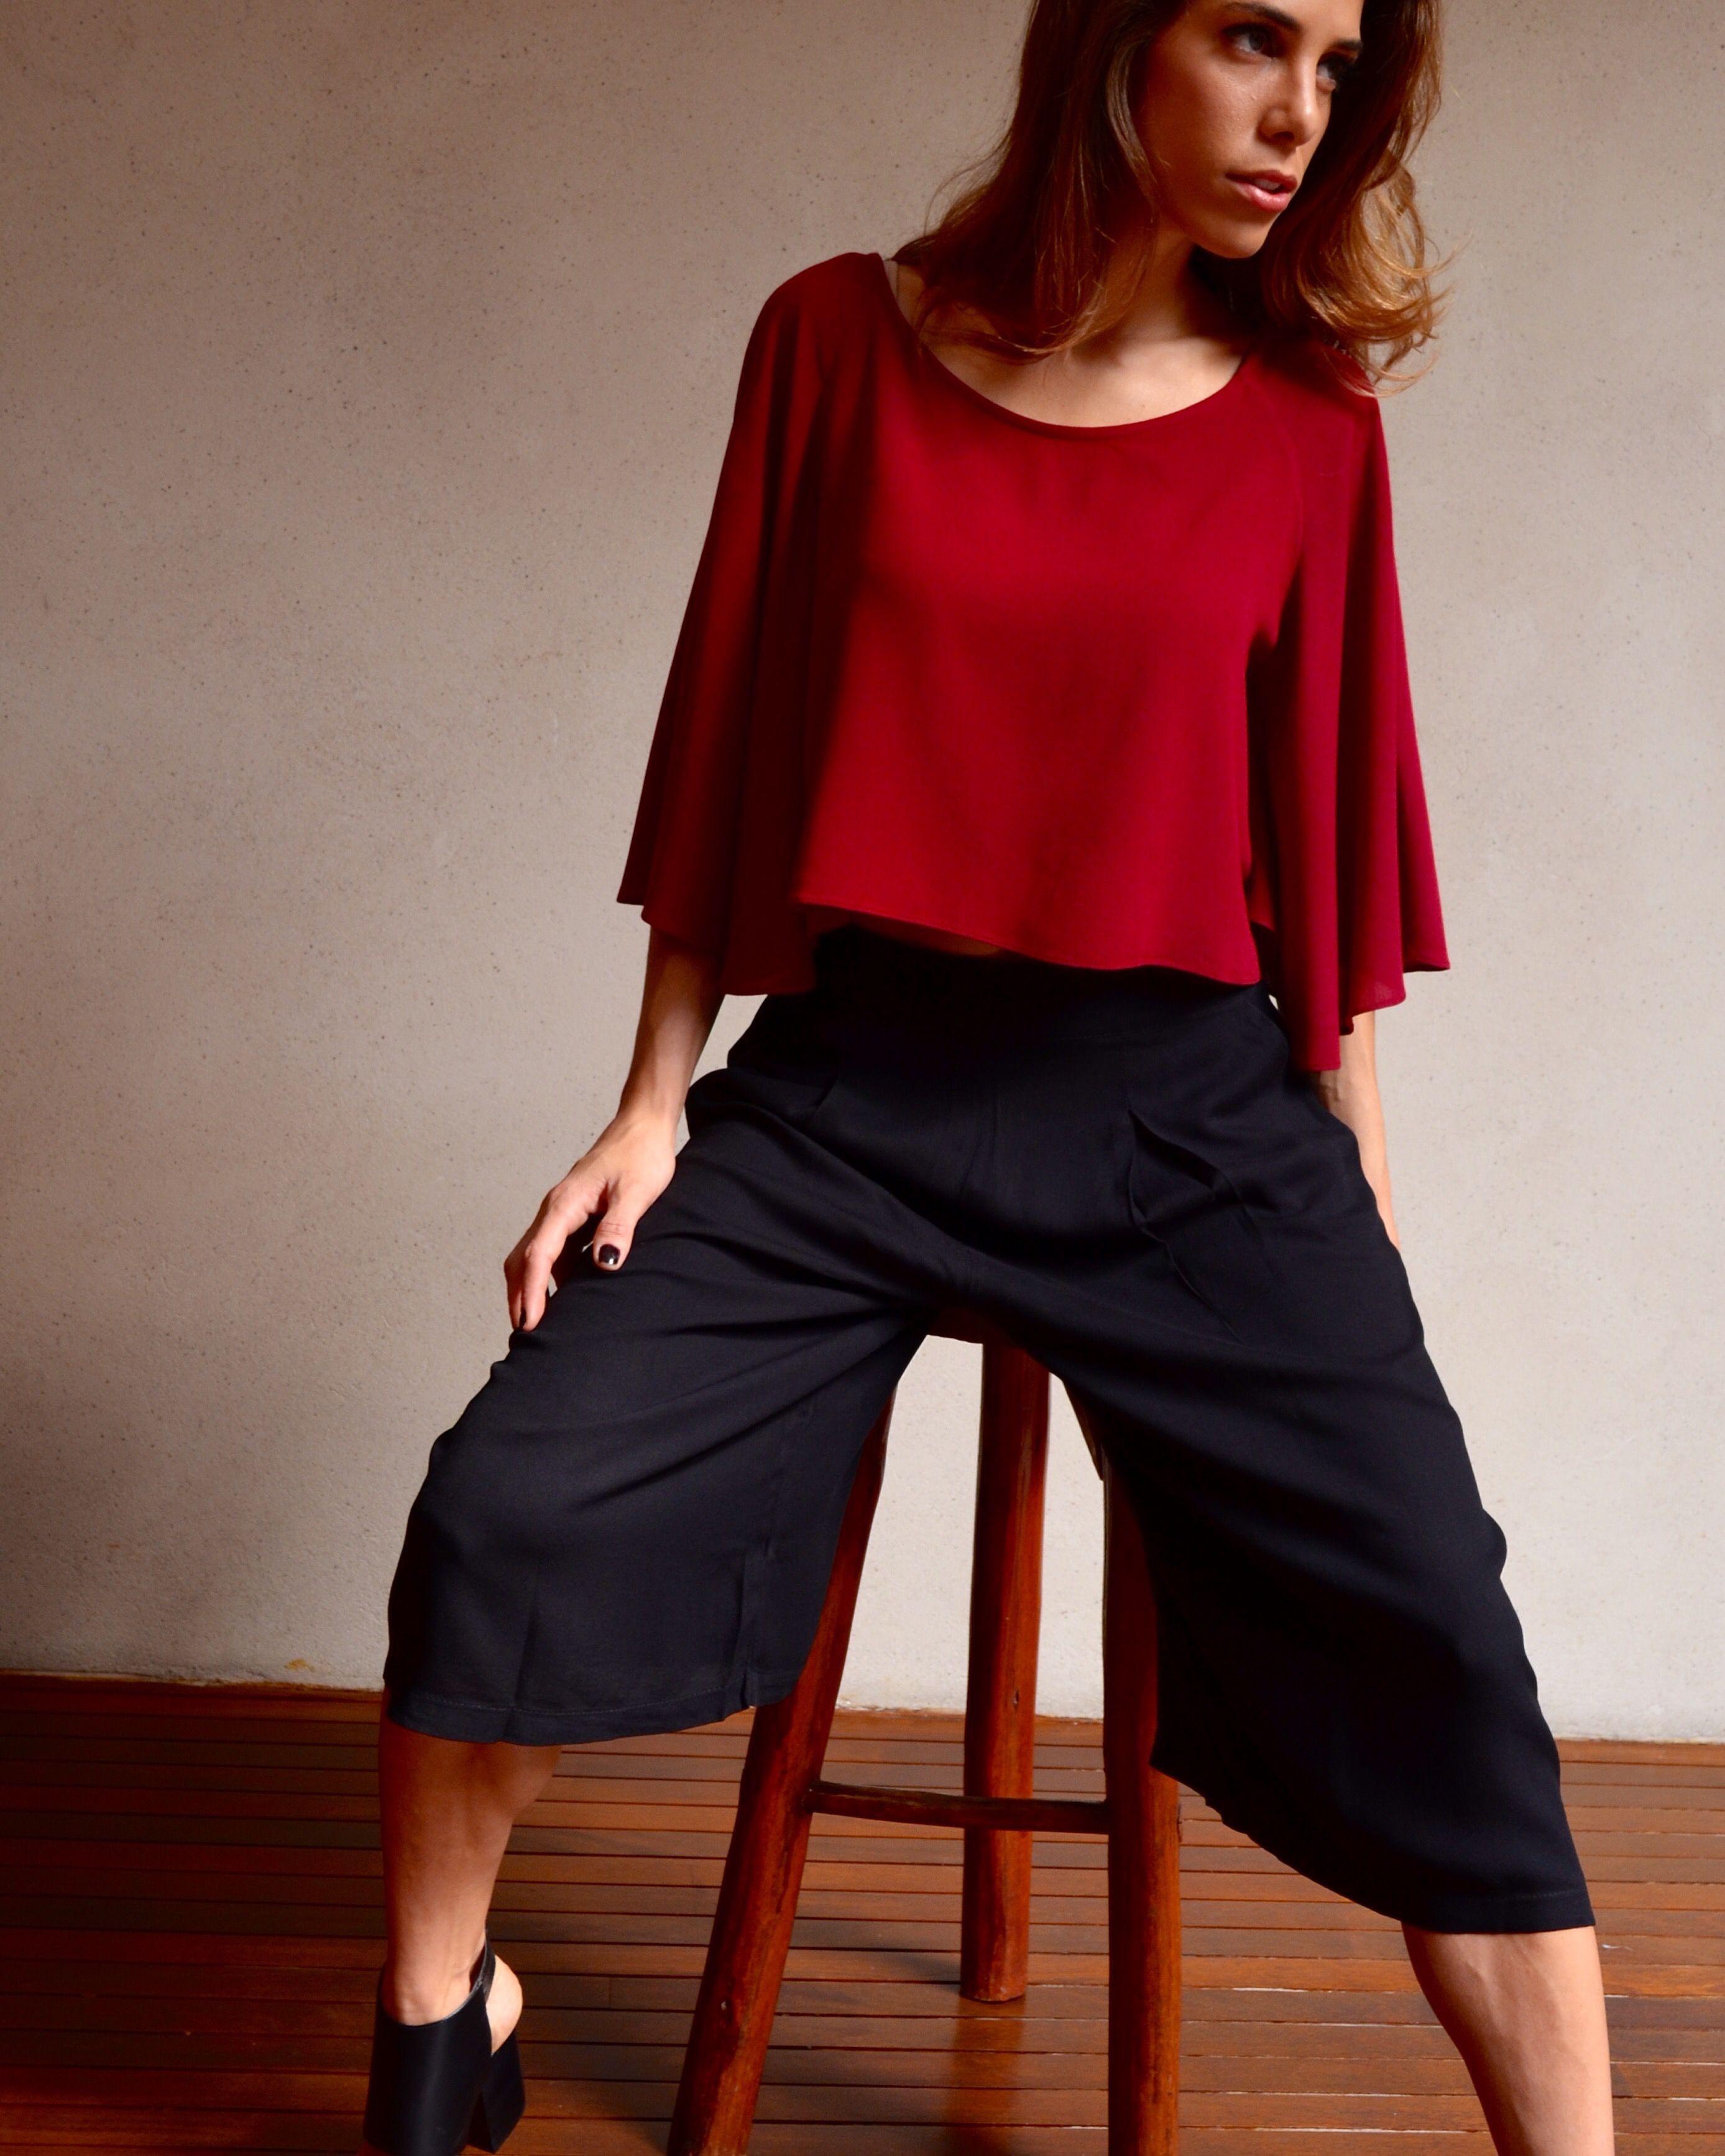 Blusa com manga ampla, estilo morcego, na cor bordô